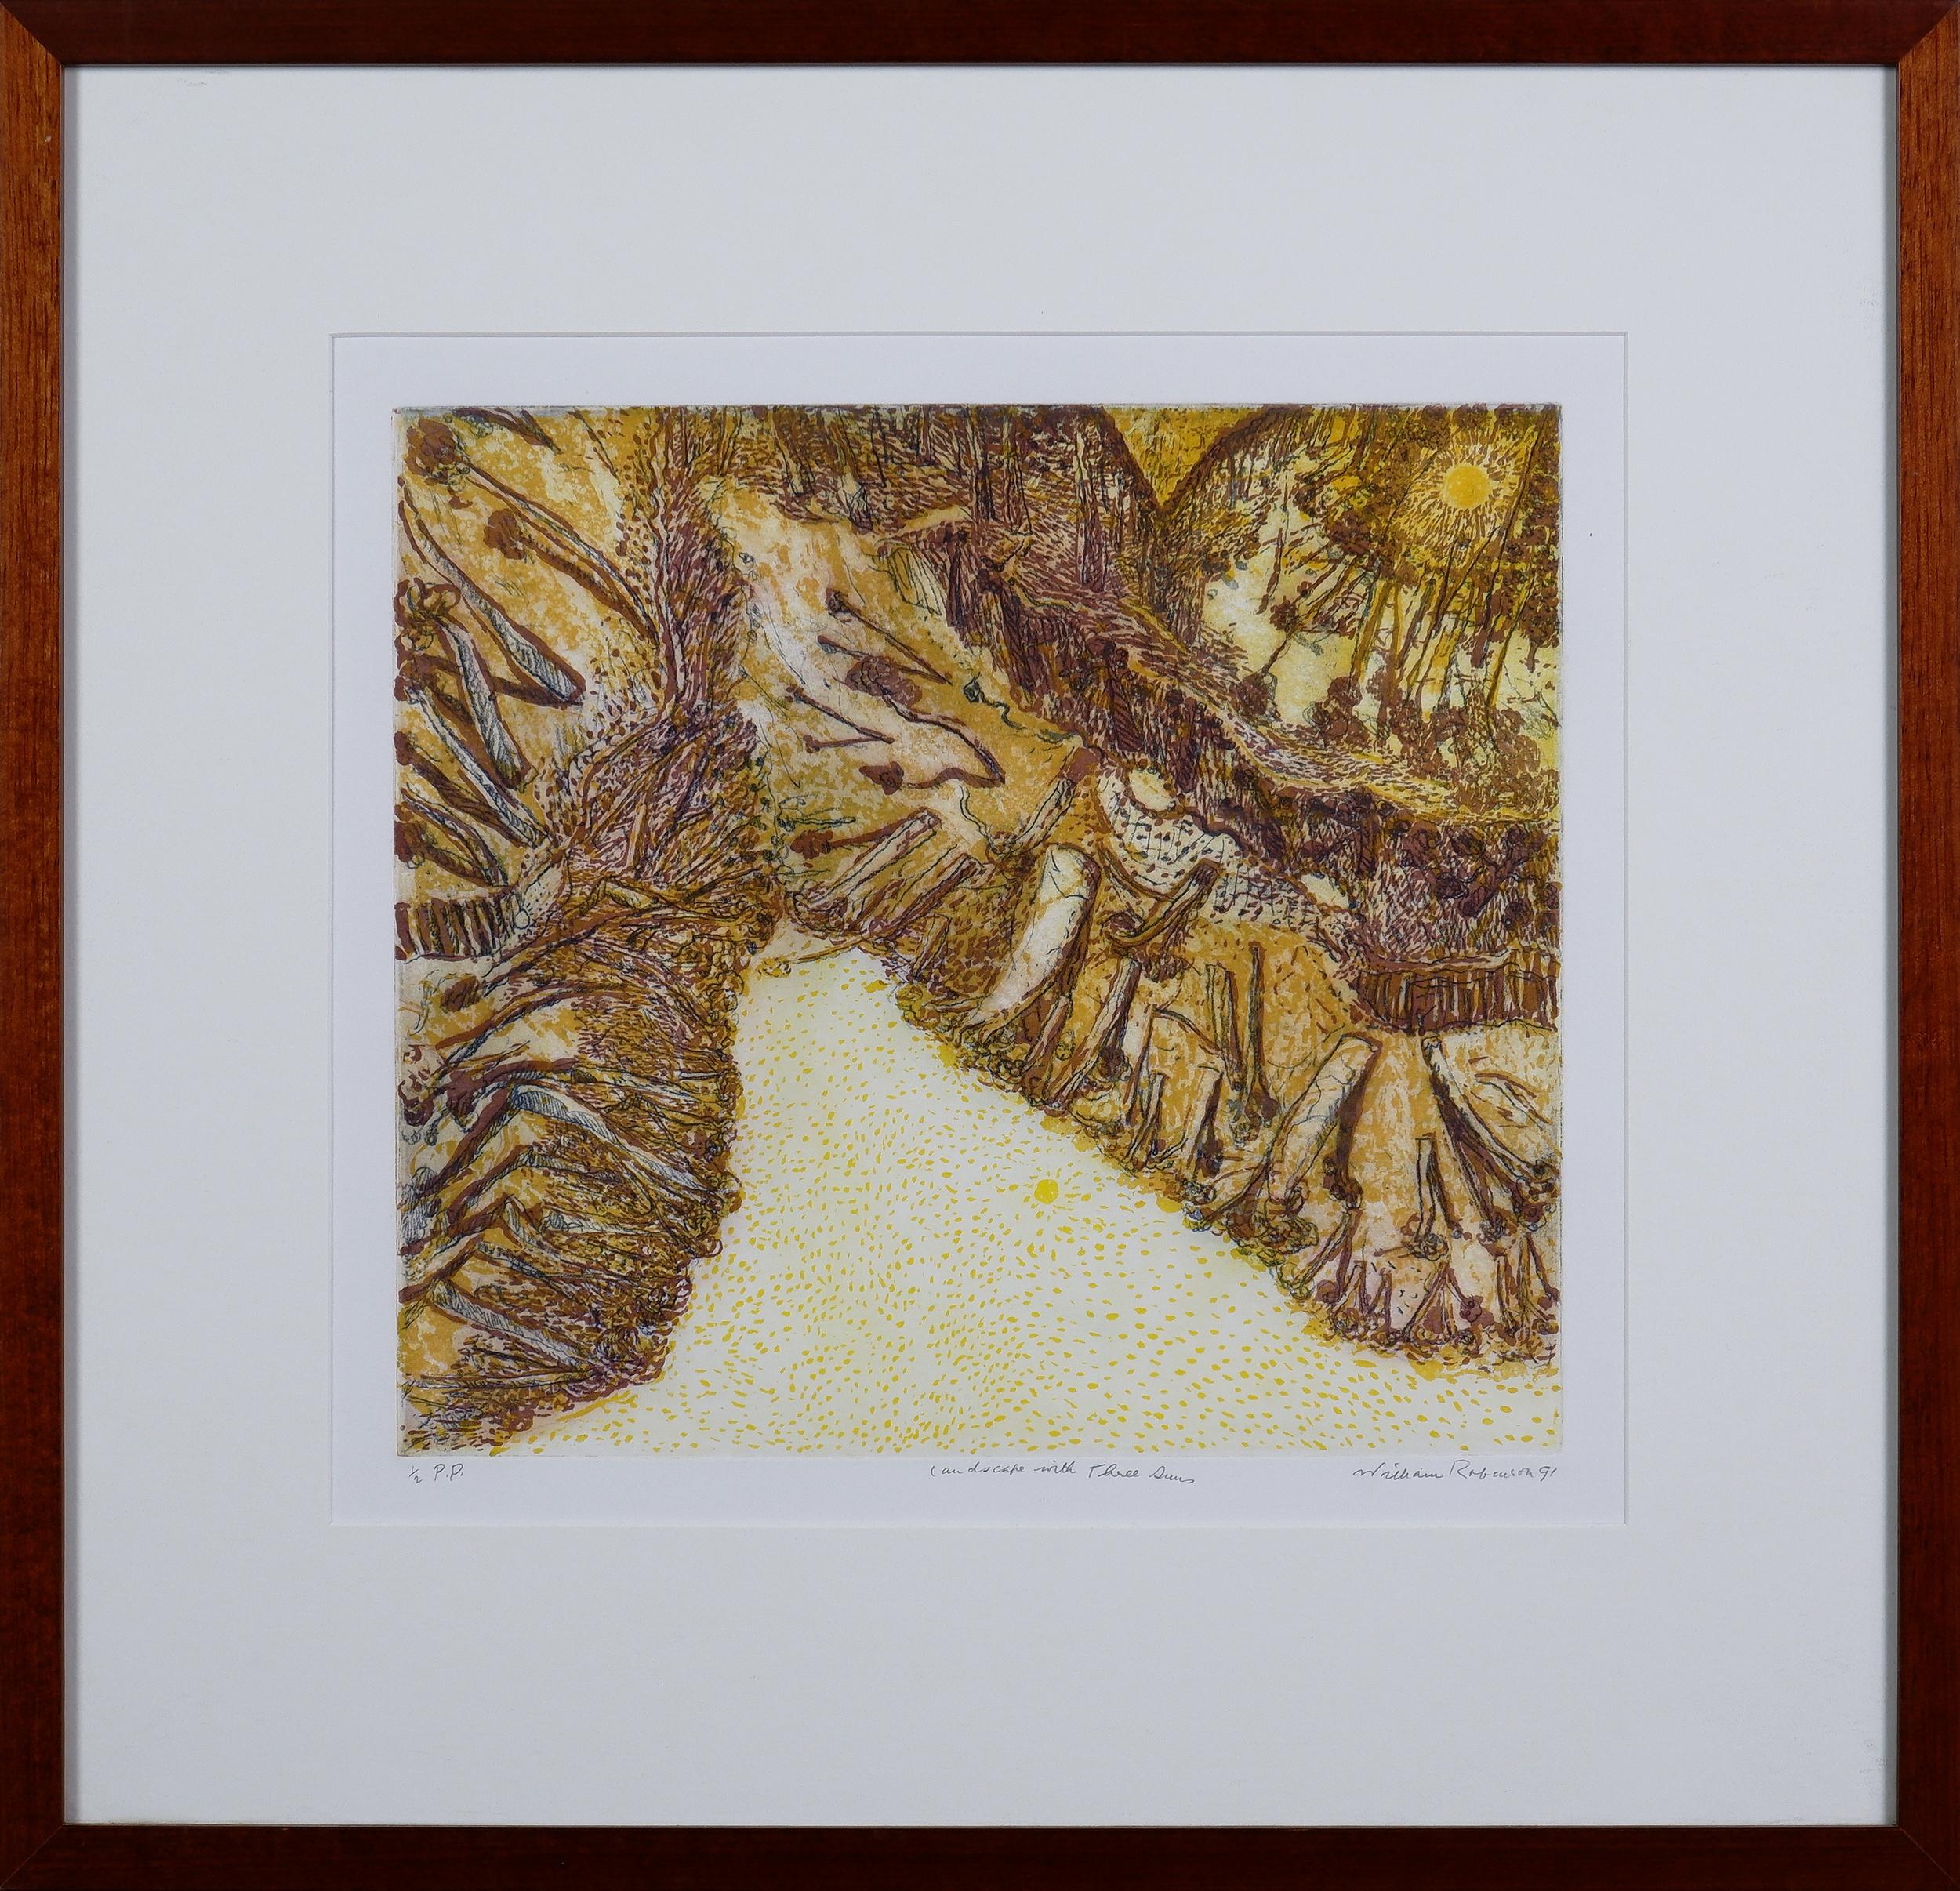 'William Robinson (born 1936), Landscape with Three Suns 1991, Colour Etching'